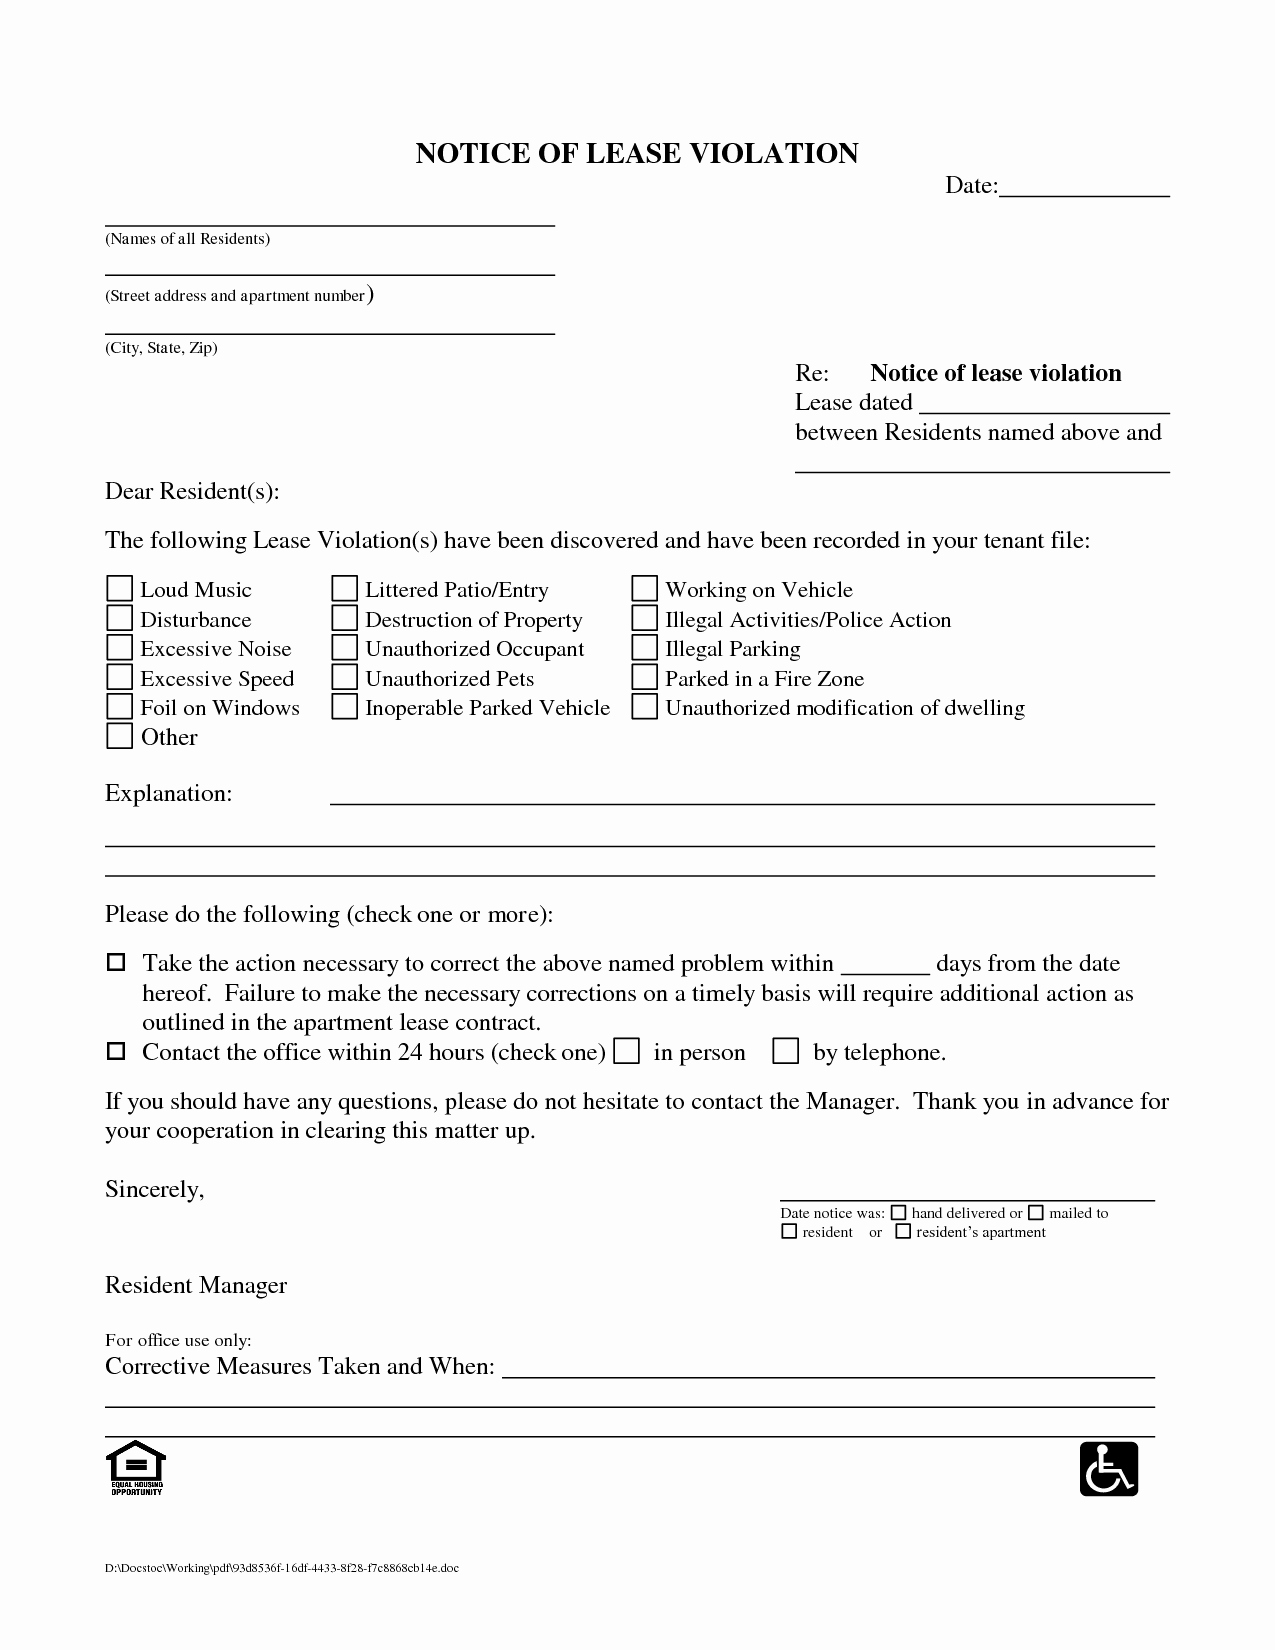 Notice Of Violation Letter Sample Inspirational Best S Of Notice Violation Letter Template for